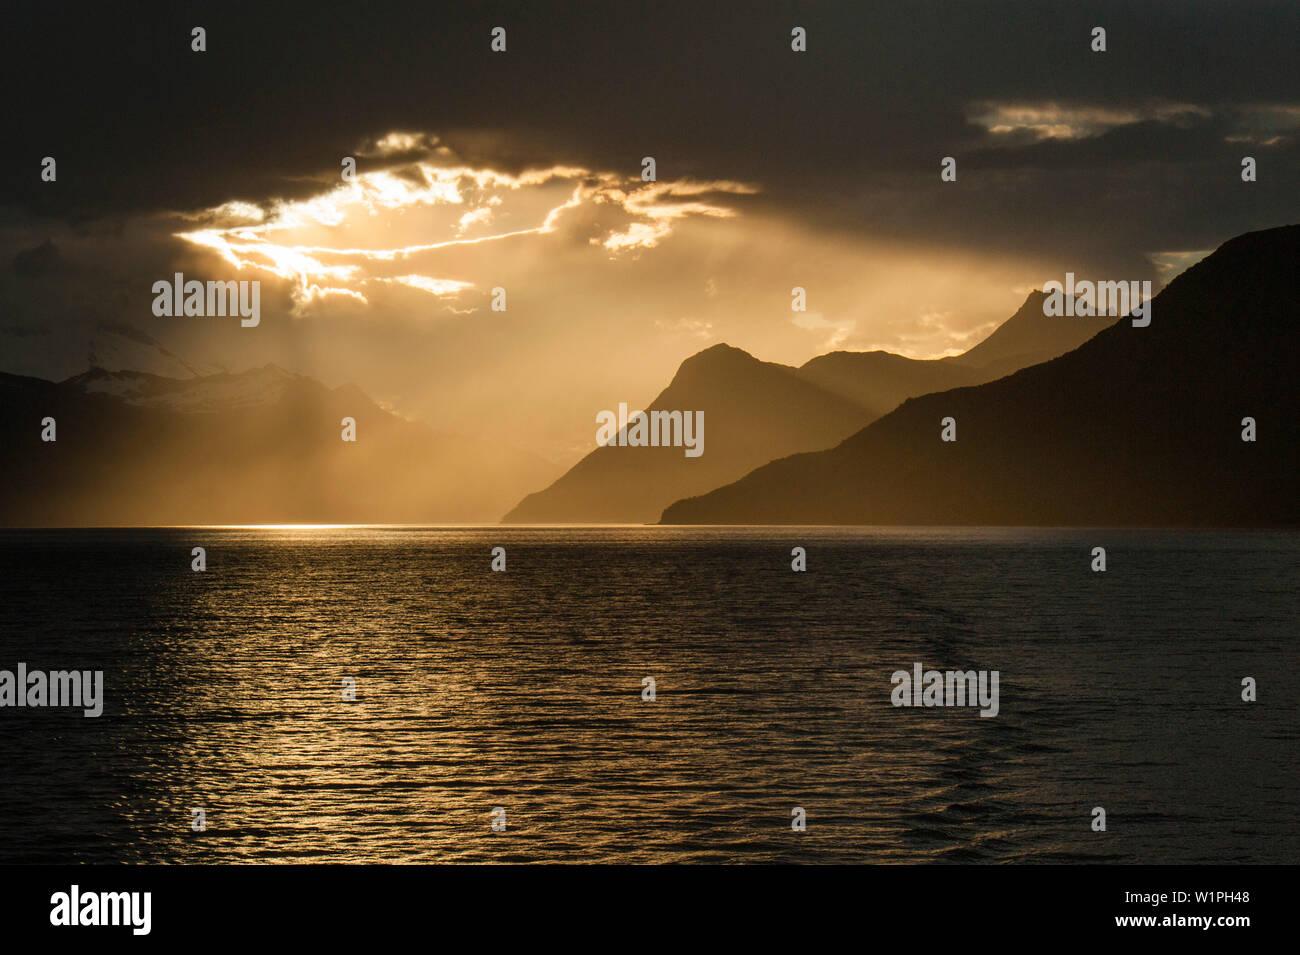 Sun breaks through cloud-cover off the Chilean coast, Beagle Canal, Alberto de Agostini National Park, Magallanes y de la Antartica Chilena, Patagonia - Stock Image